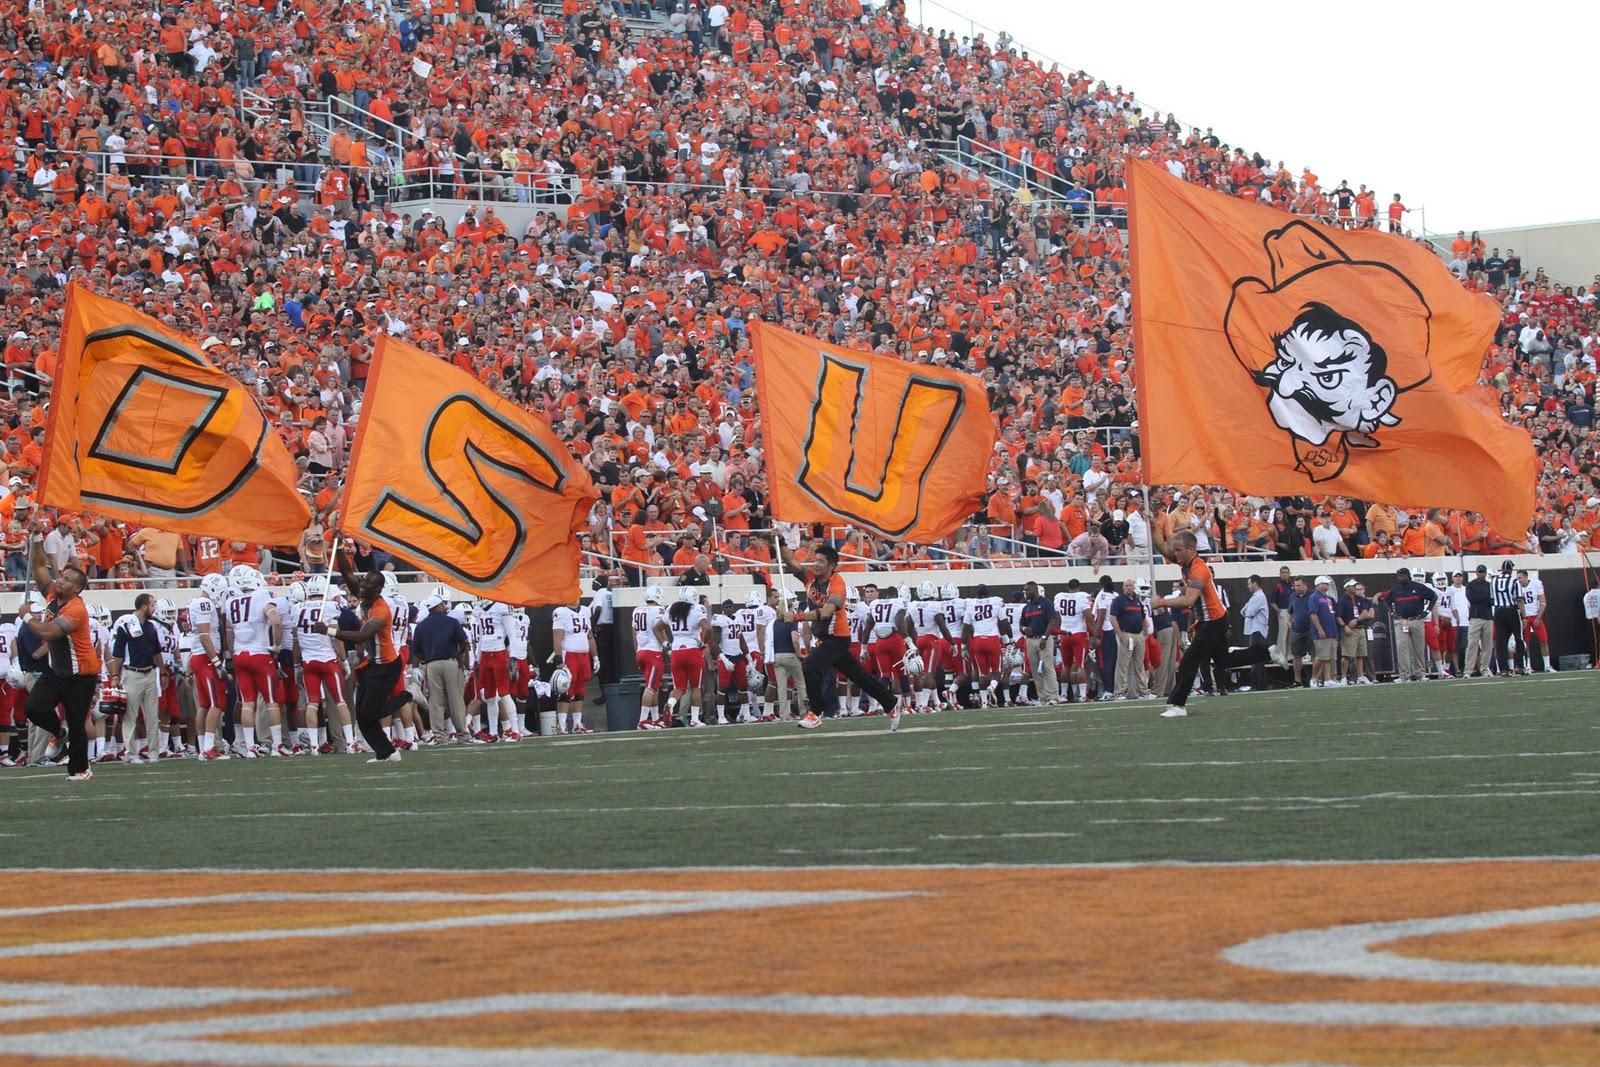 The Cowboy Huddle: Oklahoma State Football on Social Media